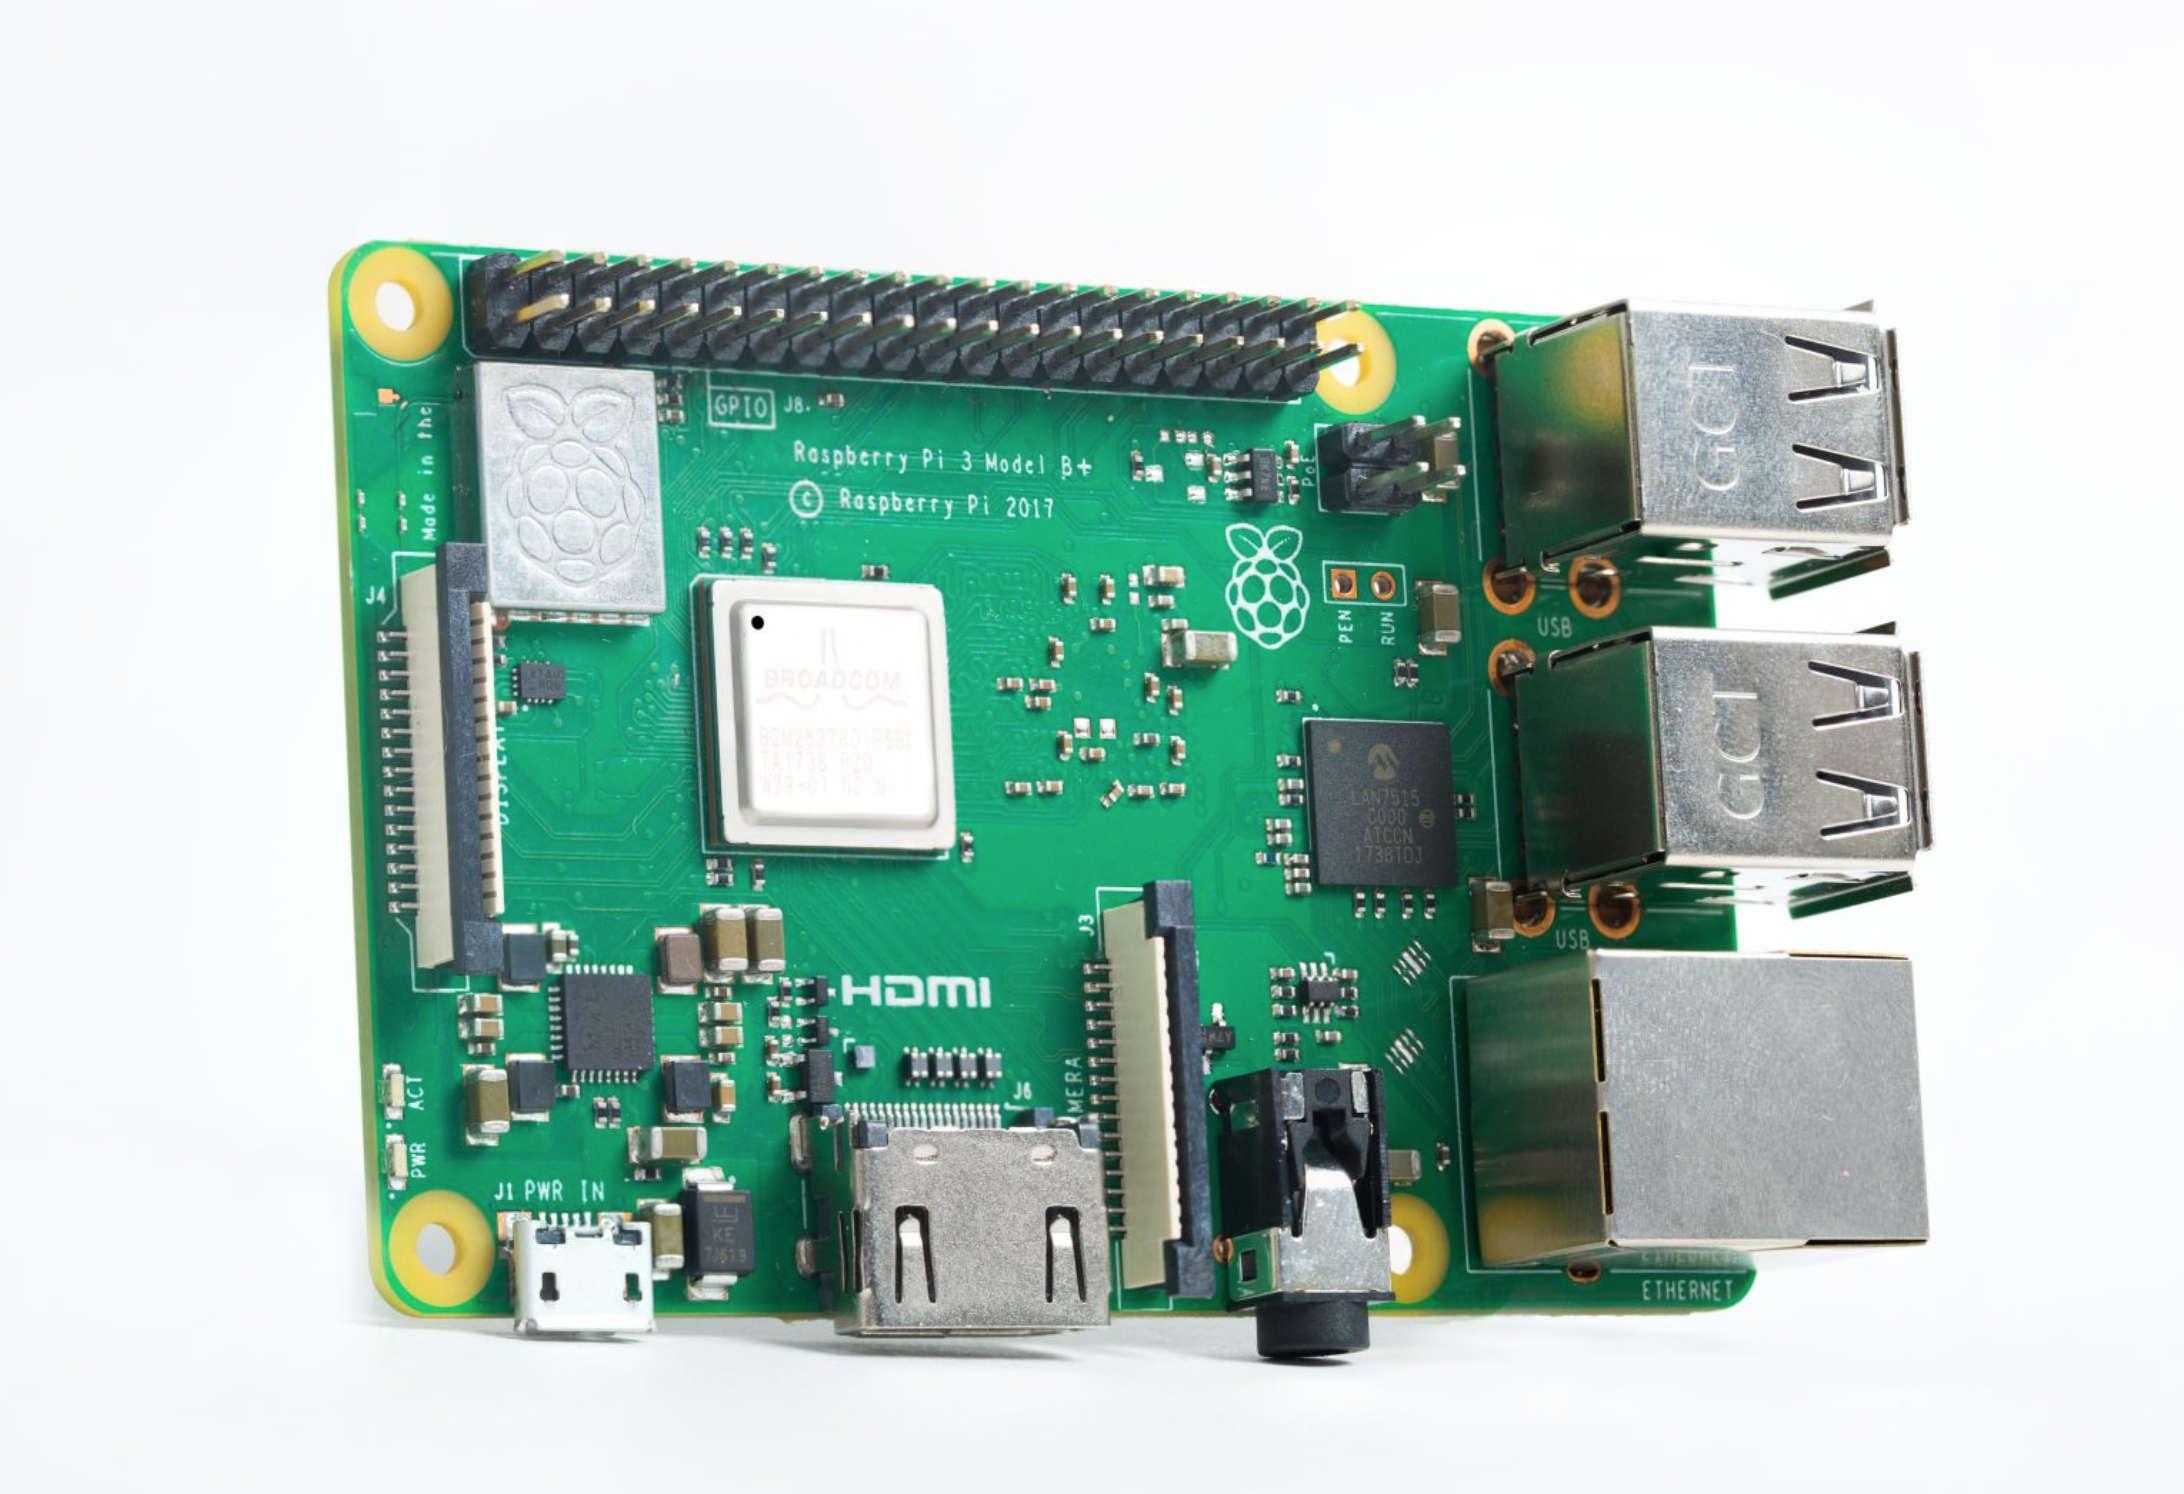 The new Raspberry Pi 3B+ | HiFiBerry